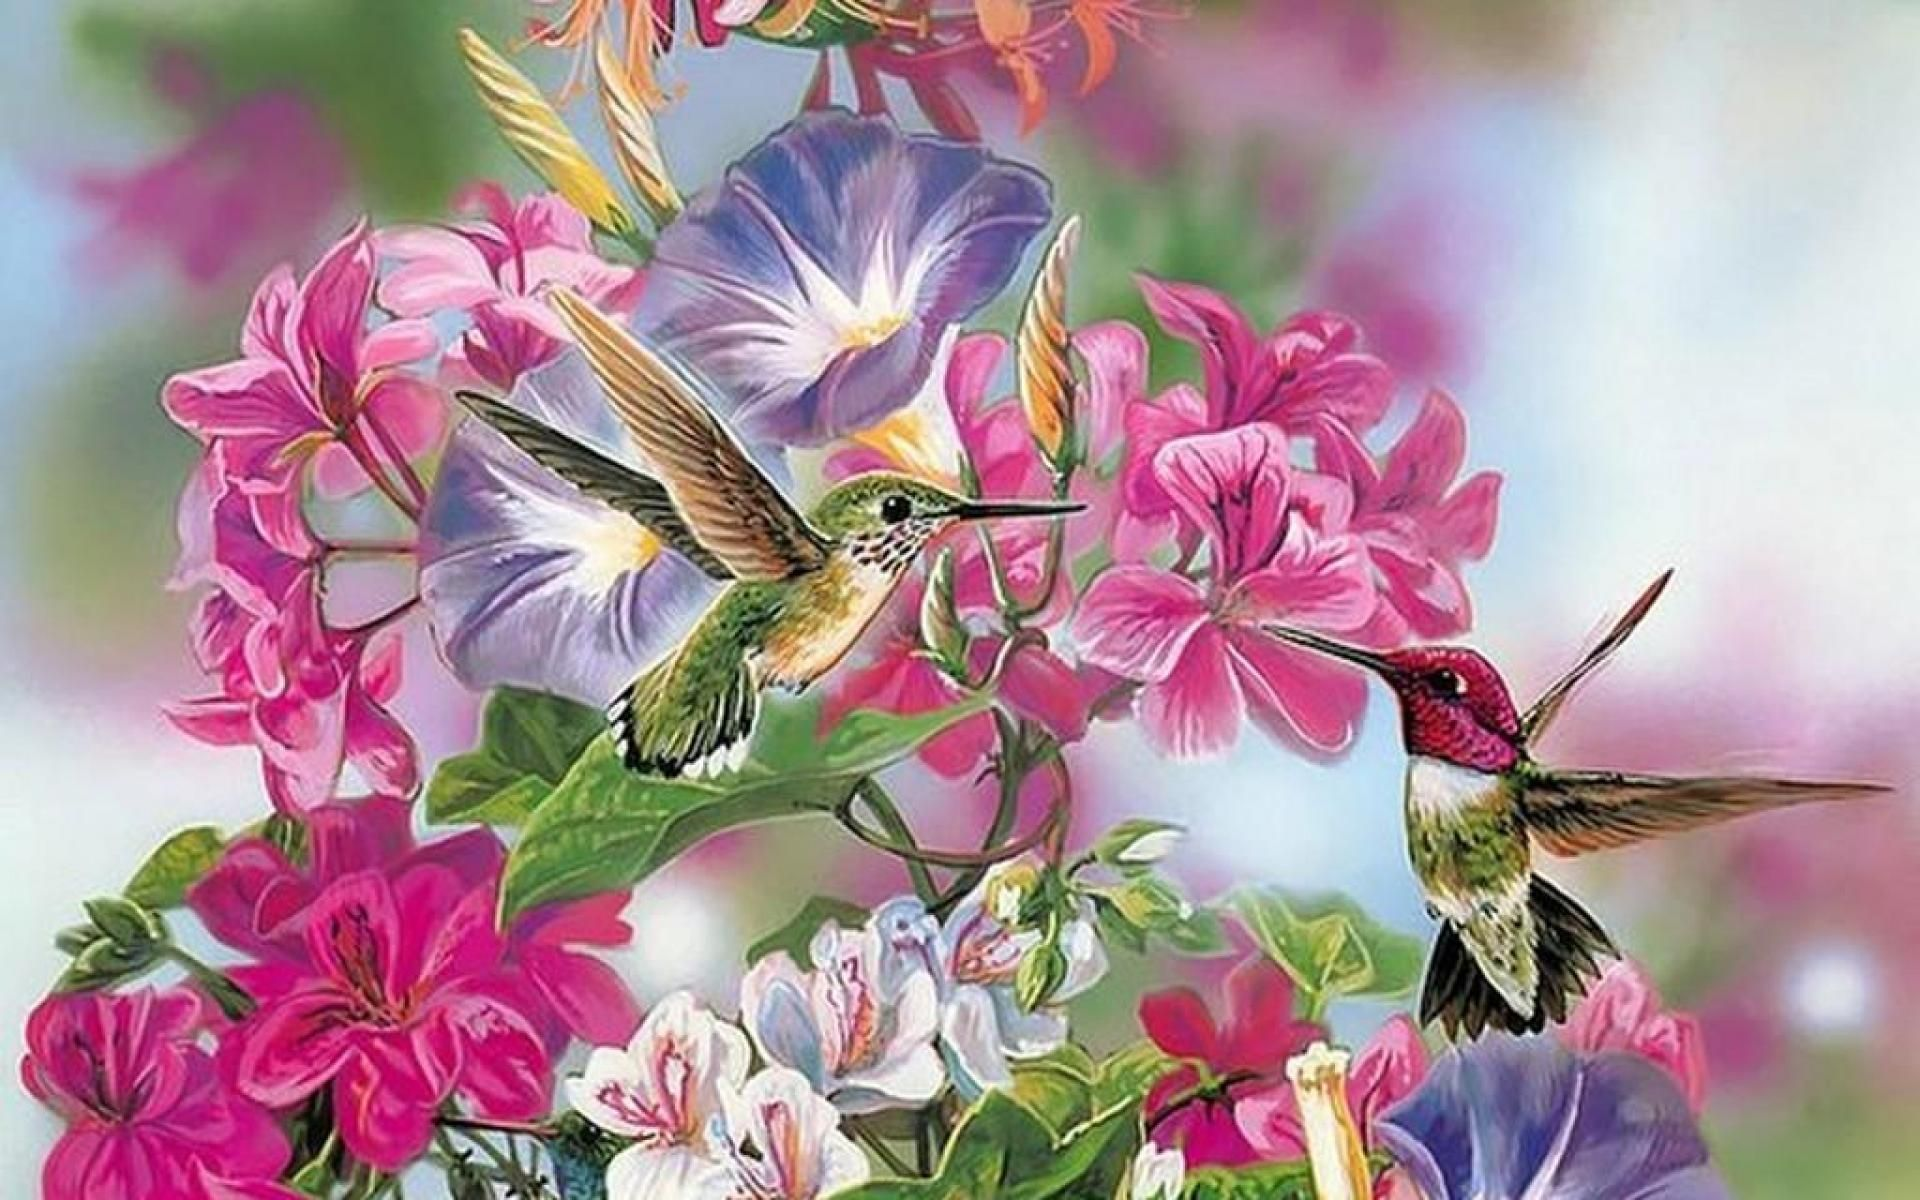 Hummingbirds Garden Flower Painting Hd Wallpaperg 19201200